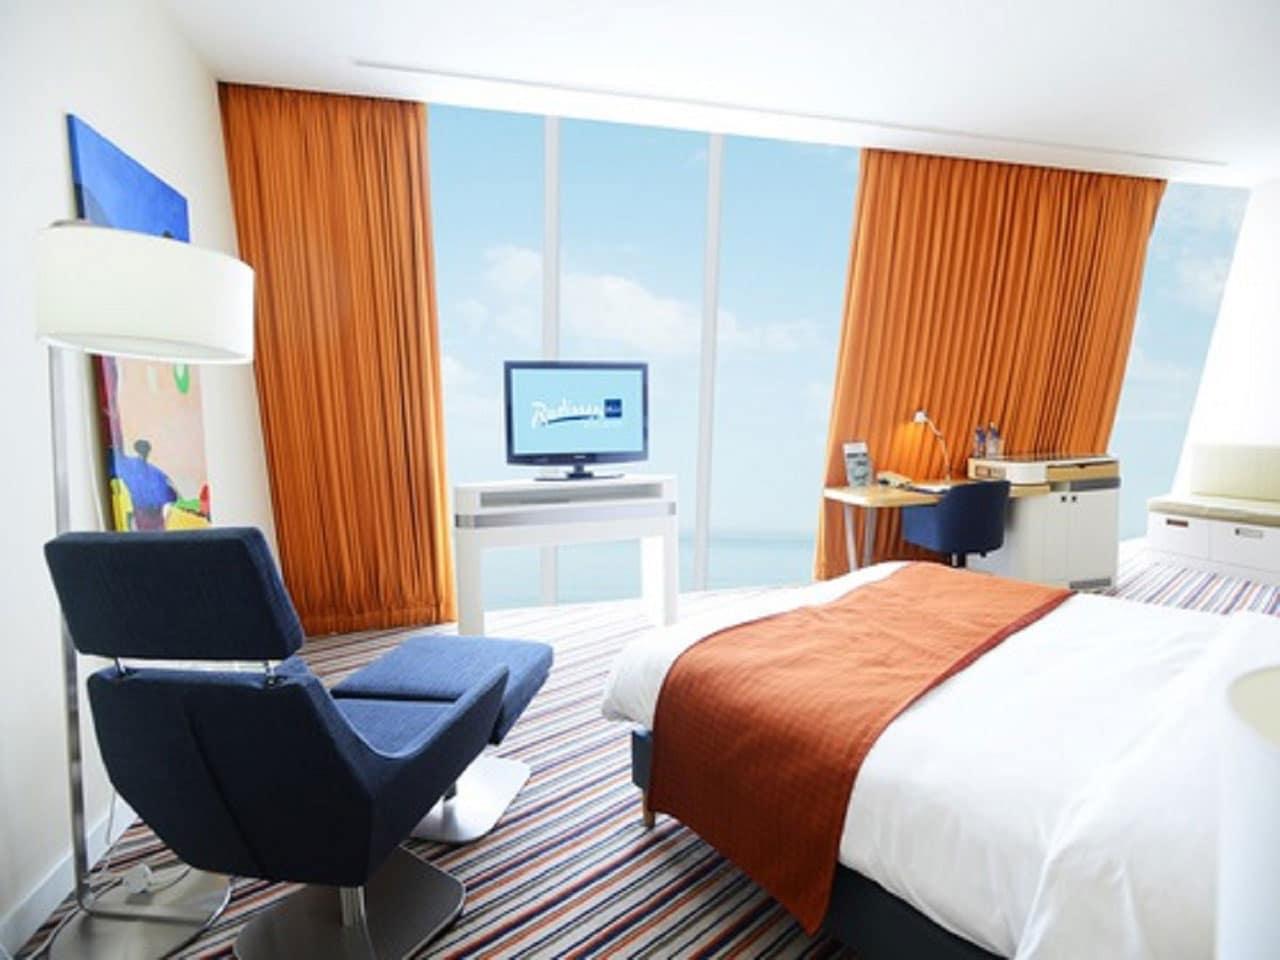 Radisson Blue Standard Room